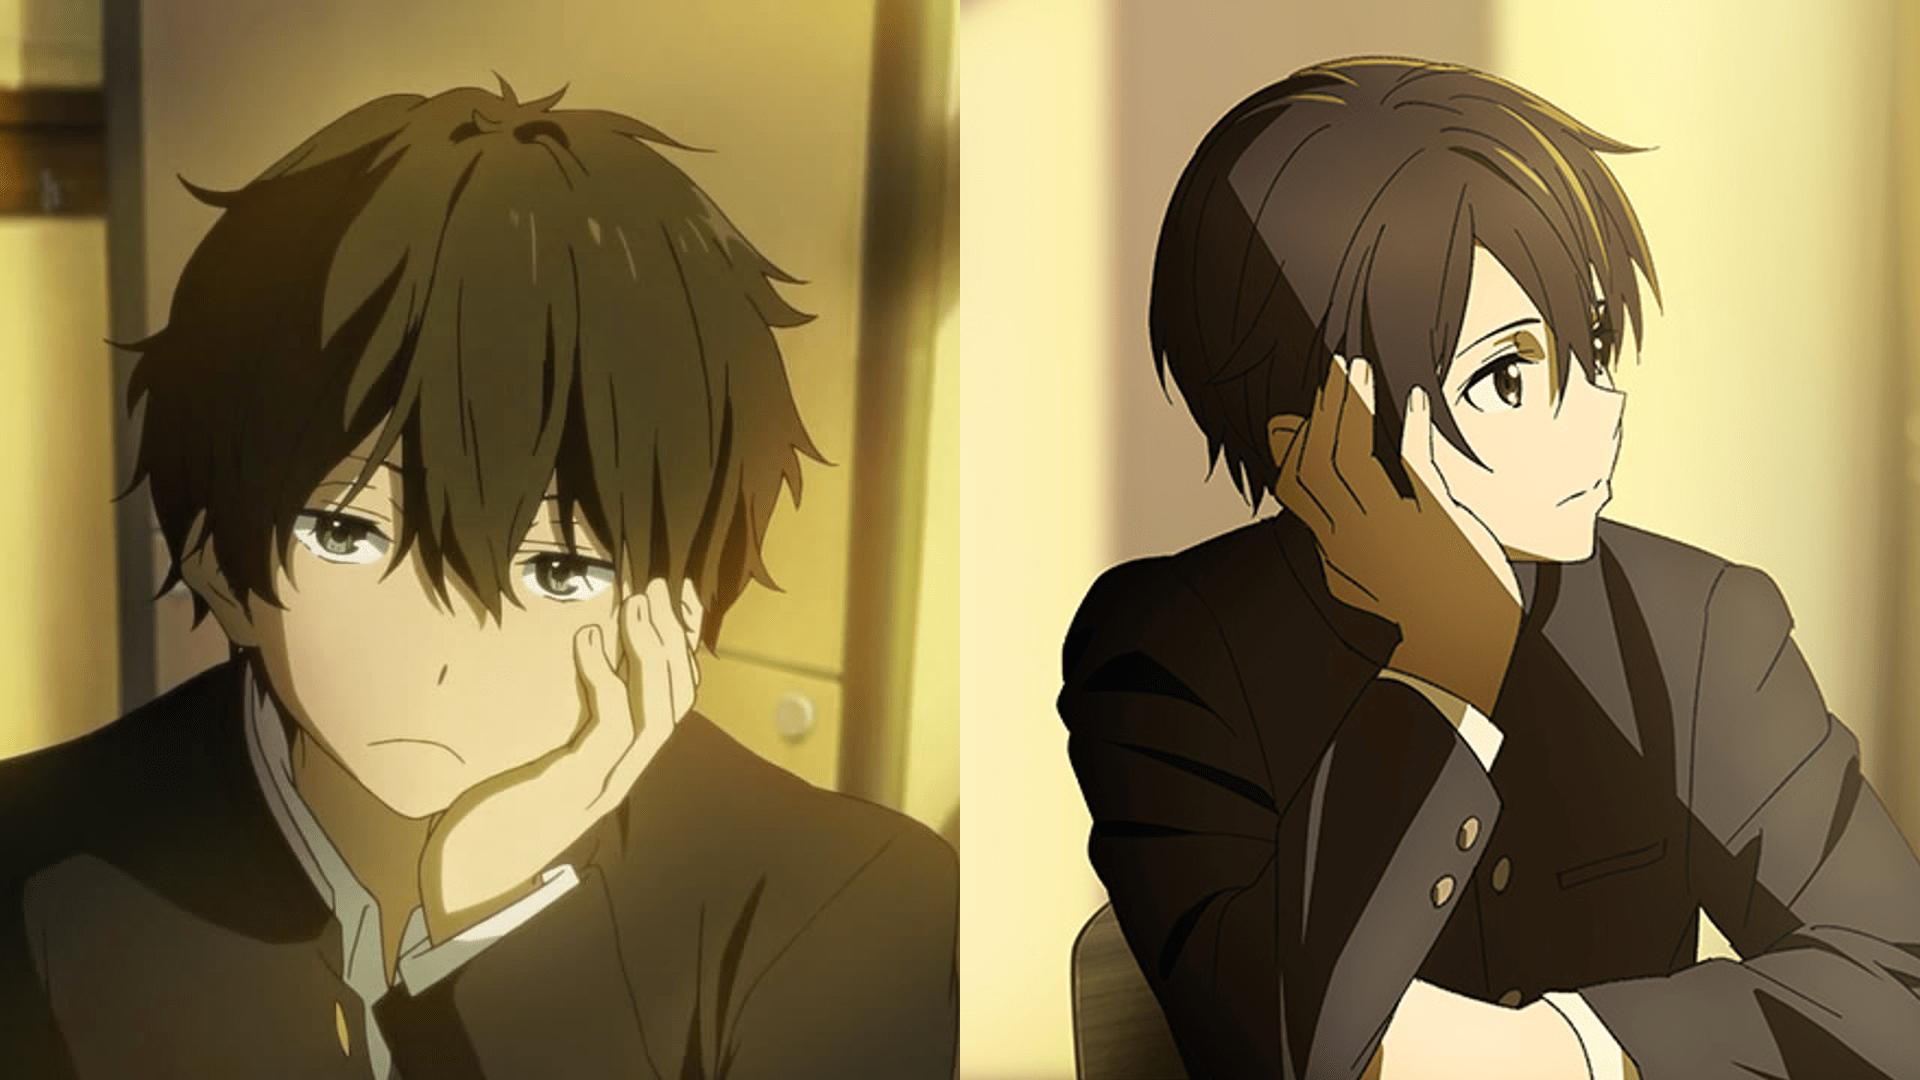 Kemiripan antara gaya Oreki Houtarou dengan Kirito dengan balutan seragam SMA.